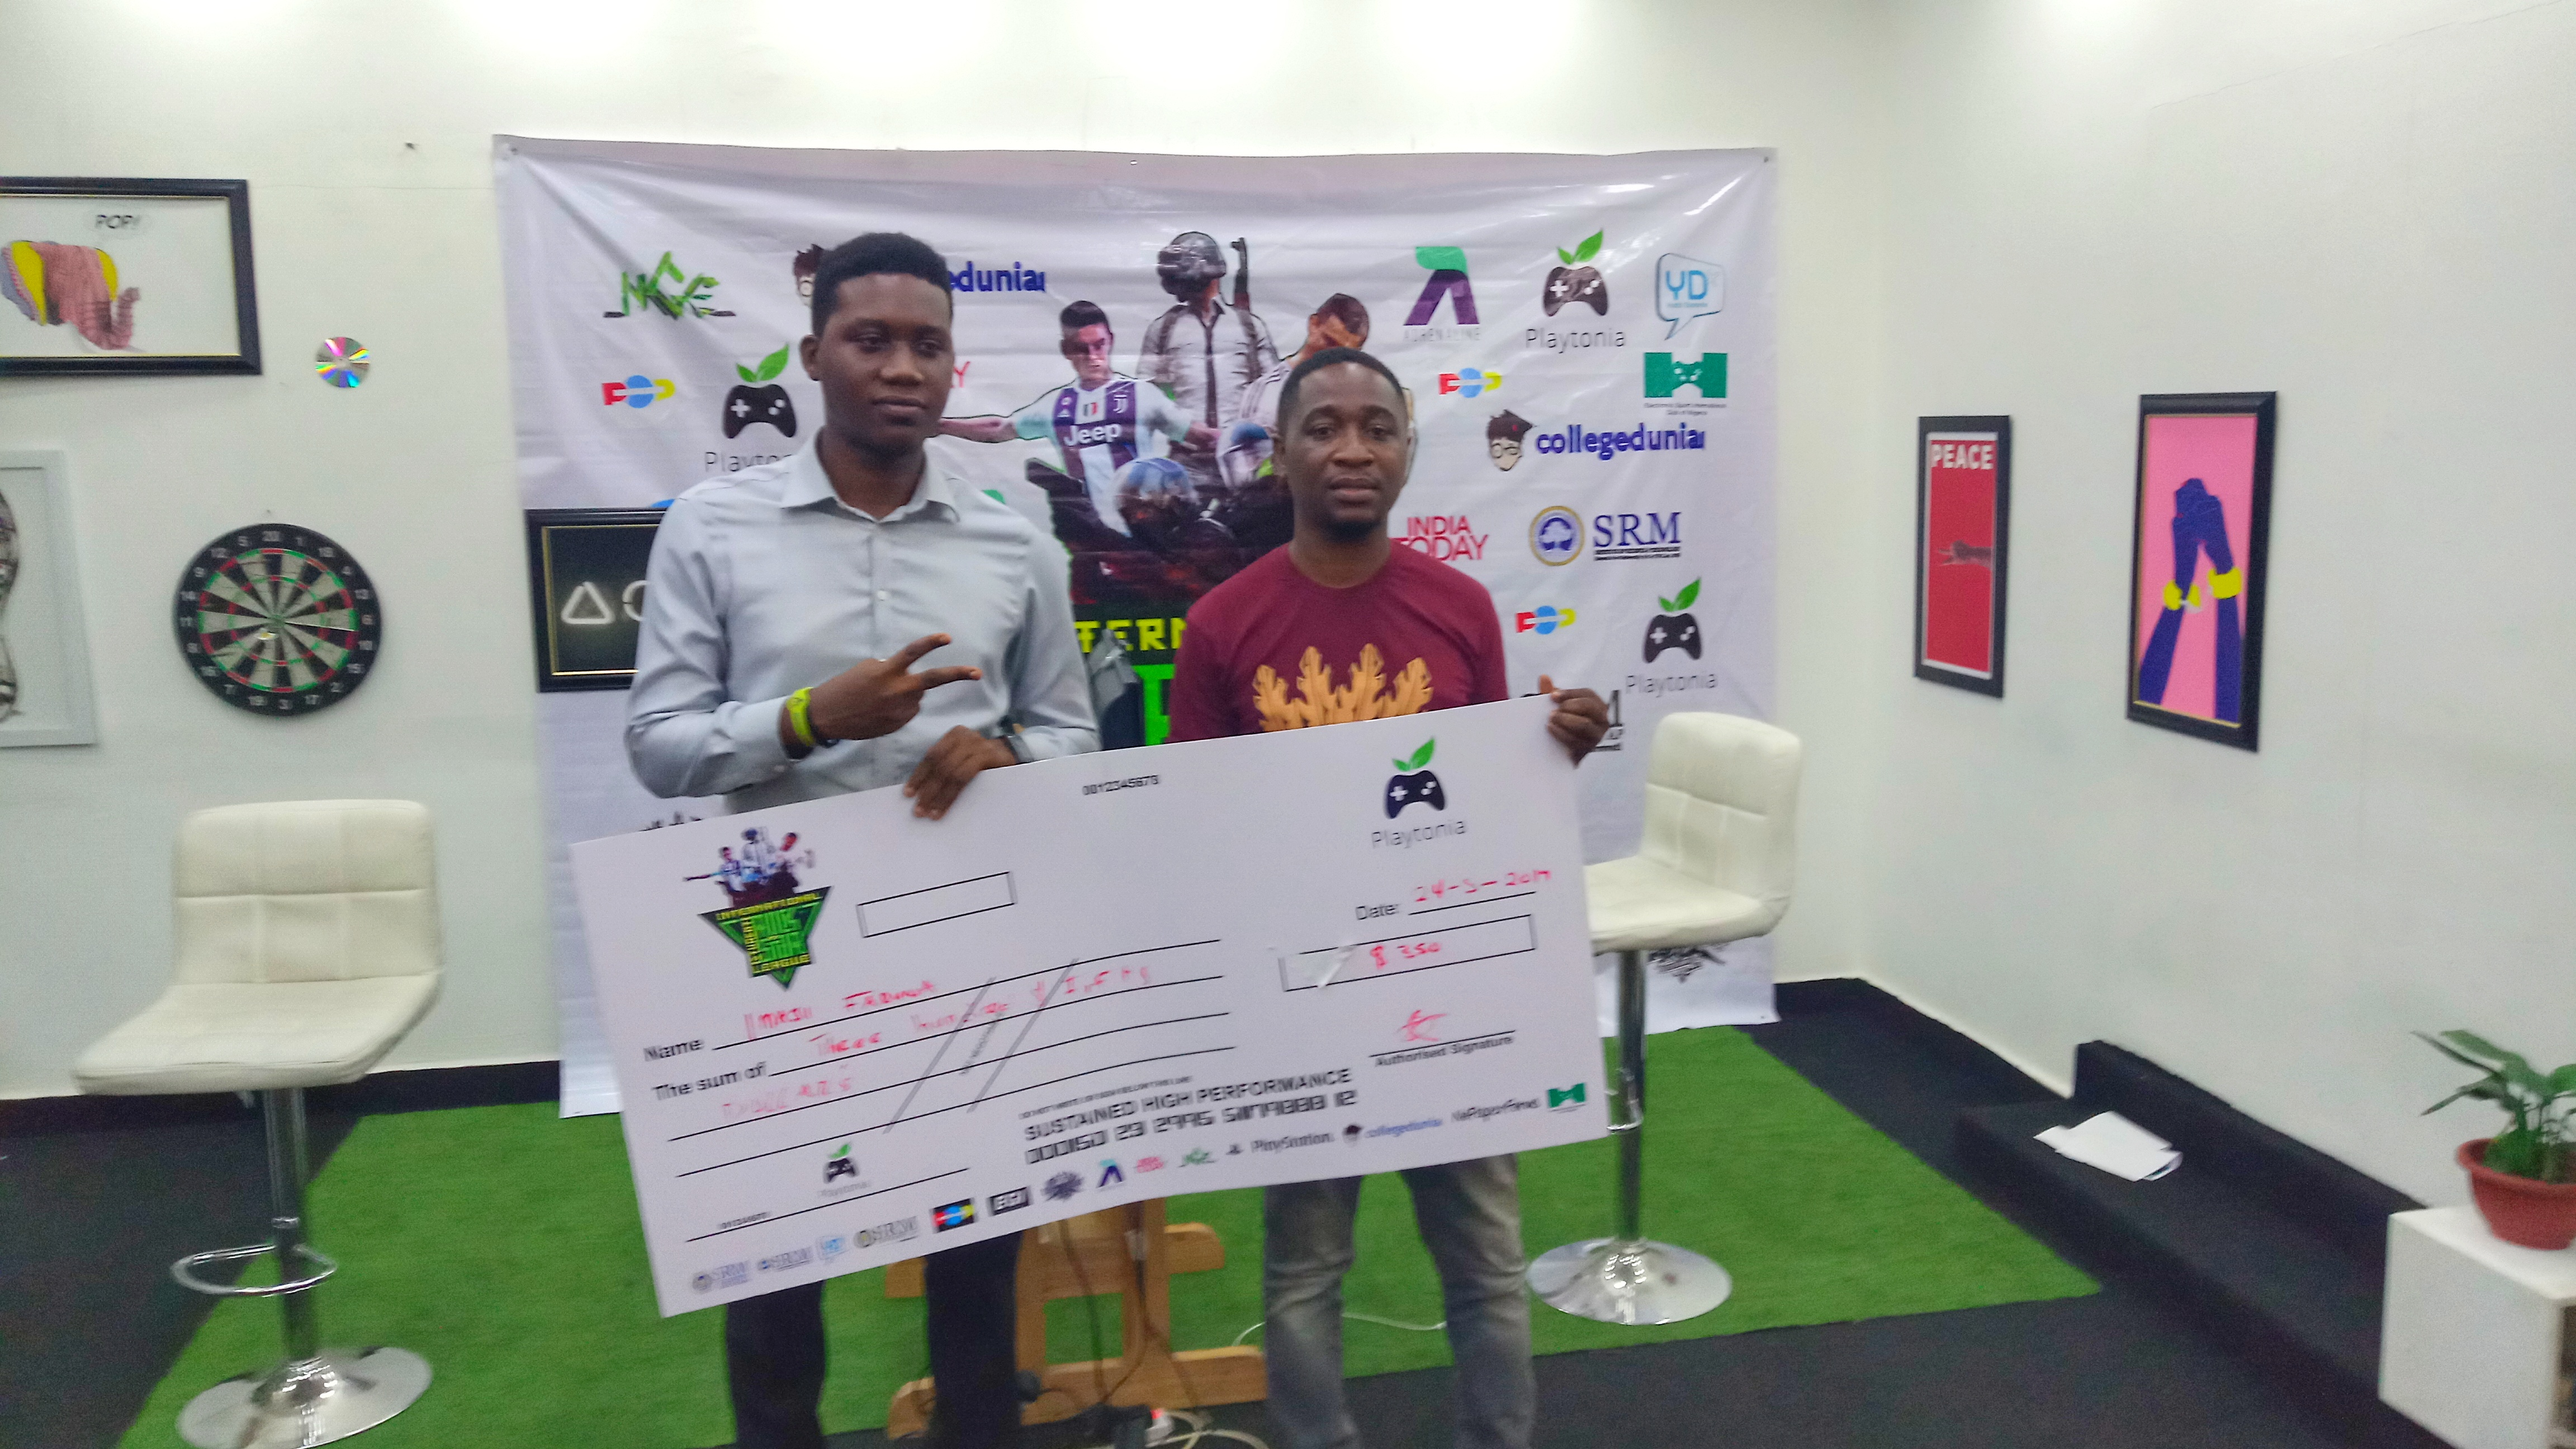 IMG 20190524 173043 2 01 - International Student Rockstar League Holds Nigerian Qualifiers.